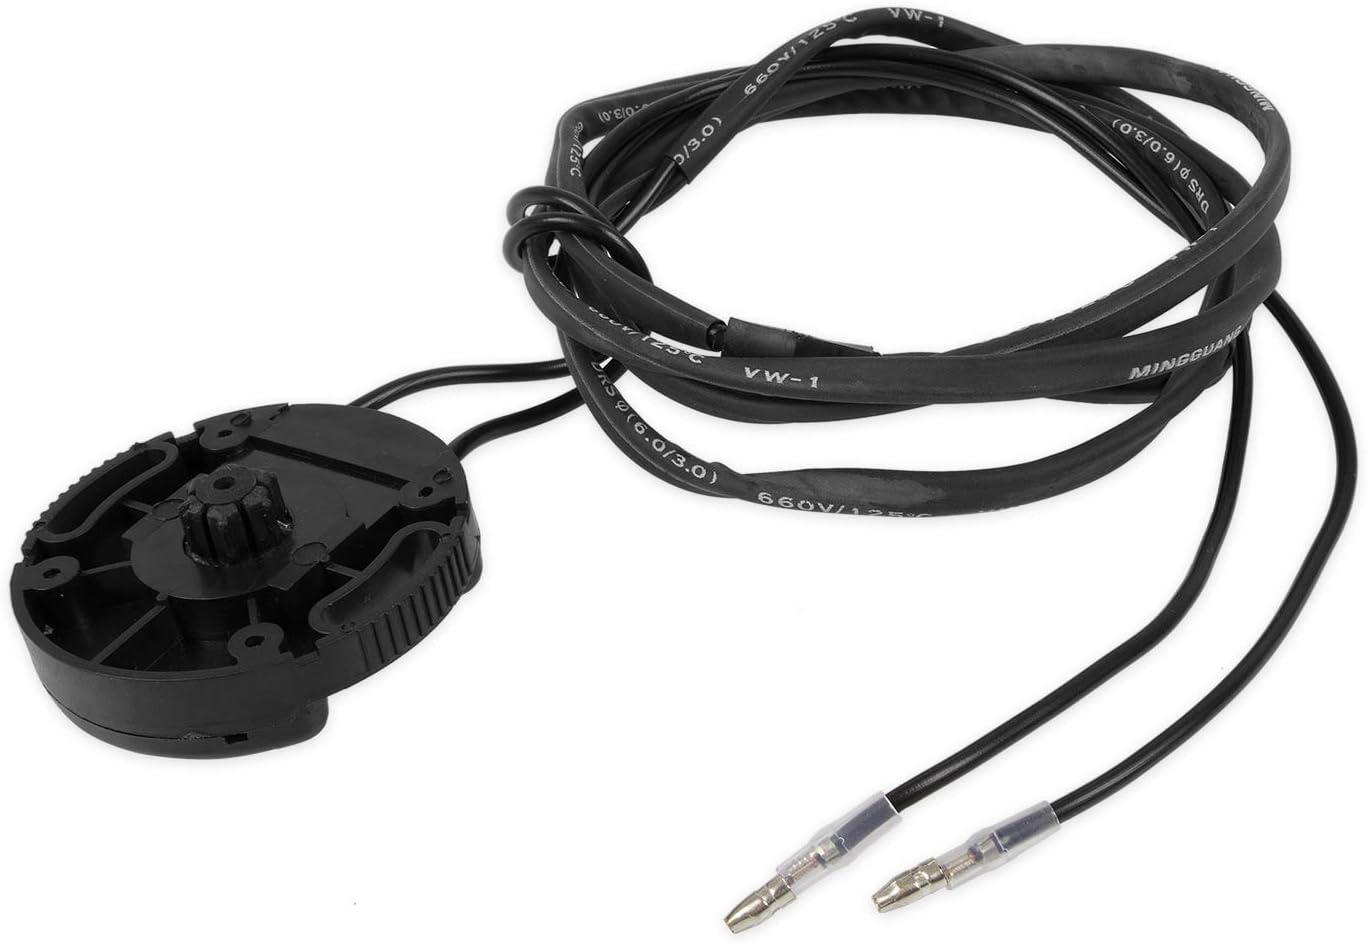 Alpha Gen II Bravo drives Replaces 805320A03 18-7633 Alpha Mercruiser Tilt Trim Sender Limit Switch Kits Compatible with MC-I MR R